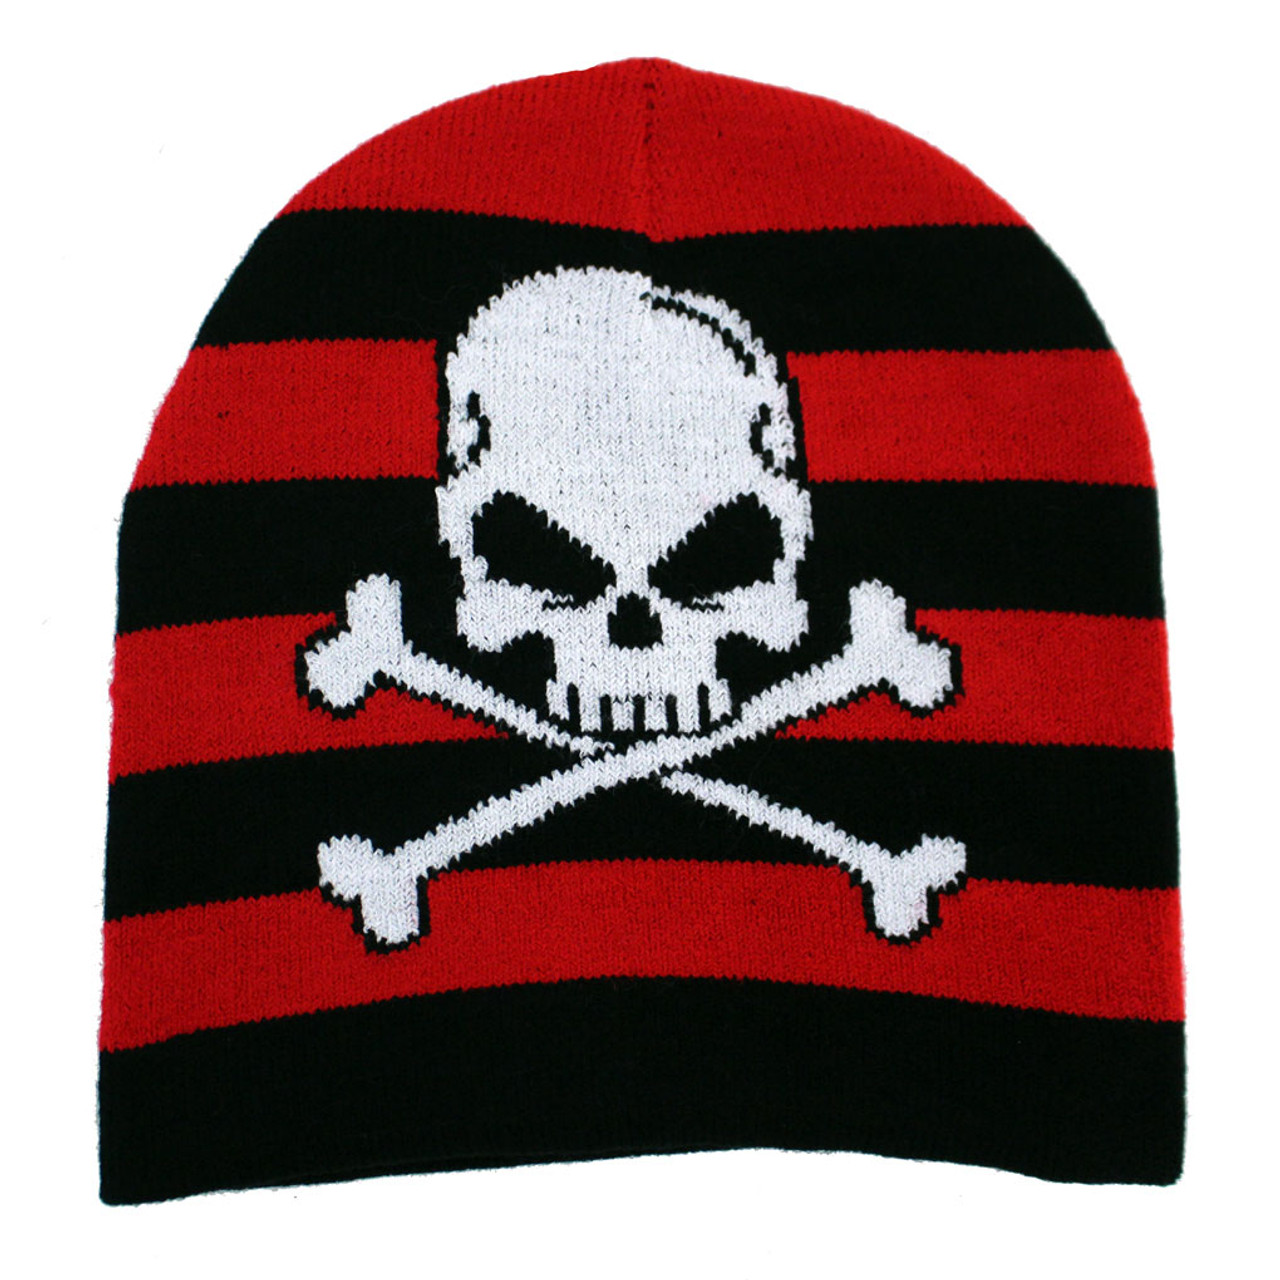 b5e2141e3475 Skull   Crossbones Black Red Striped Beanie Knit Hat - Purple ...